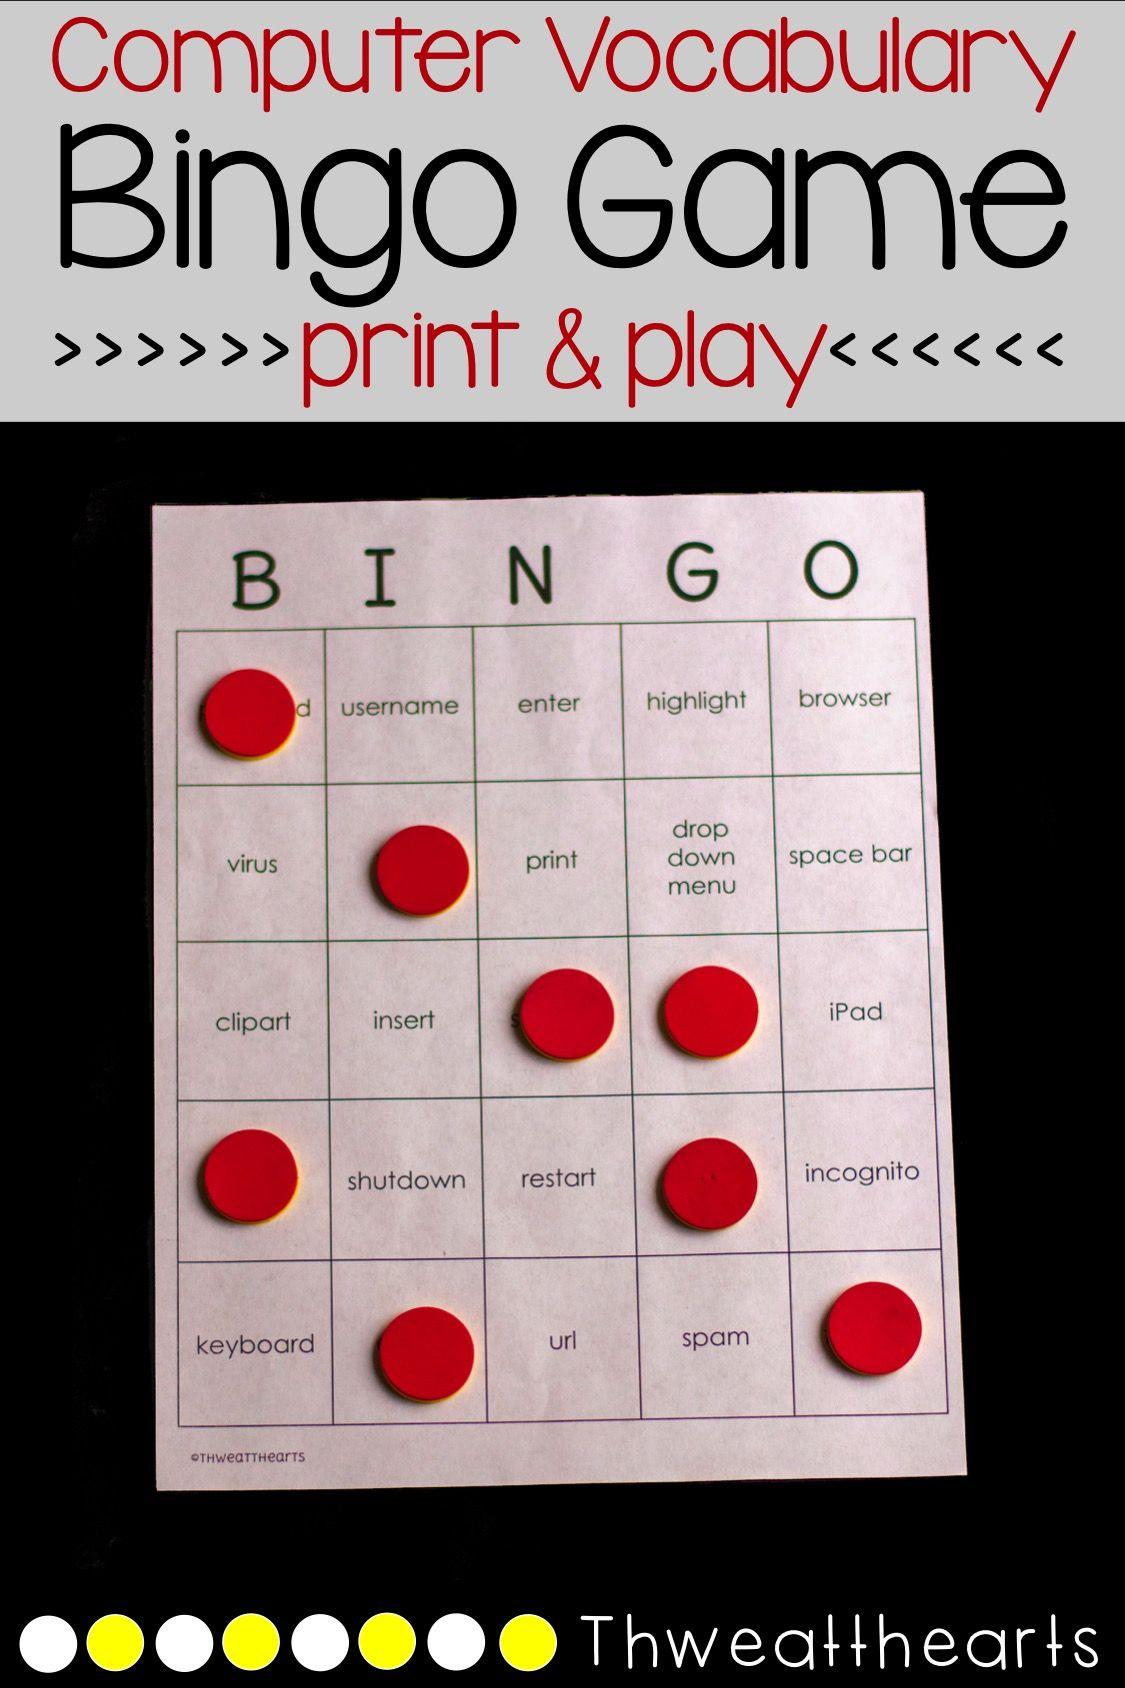 Computer Vocabulary Bingo Game 2